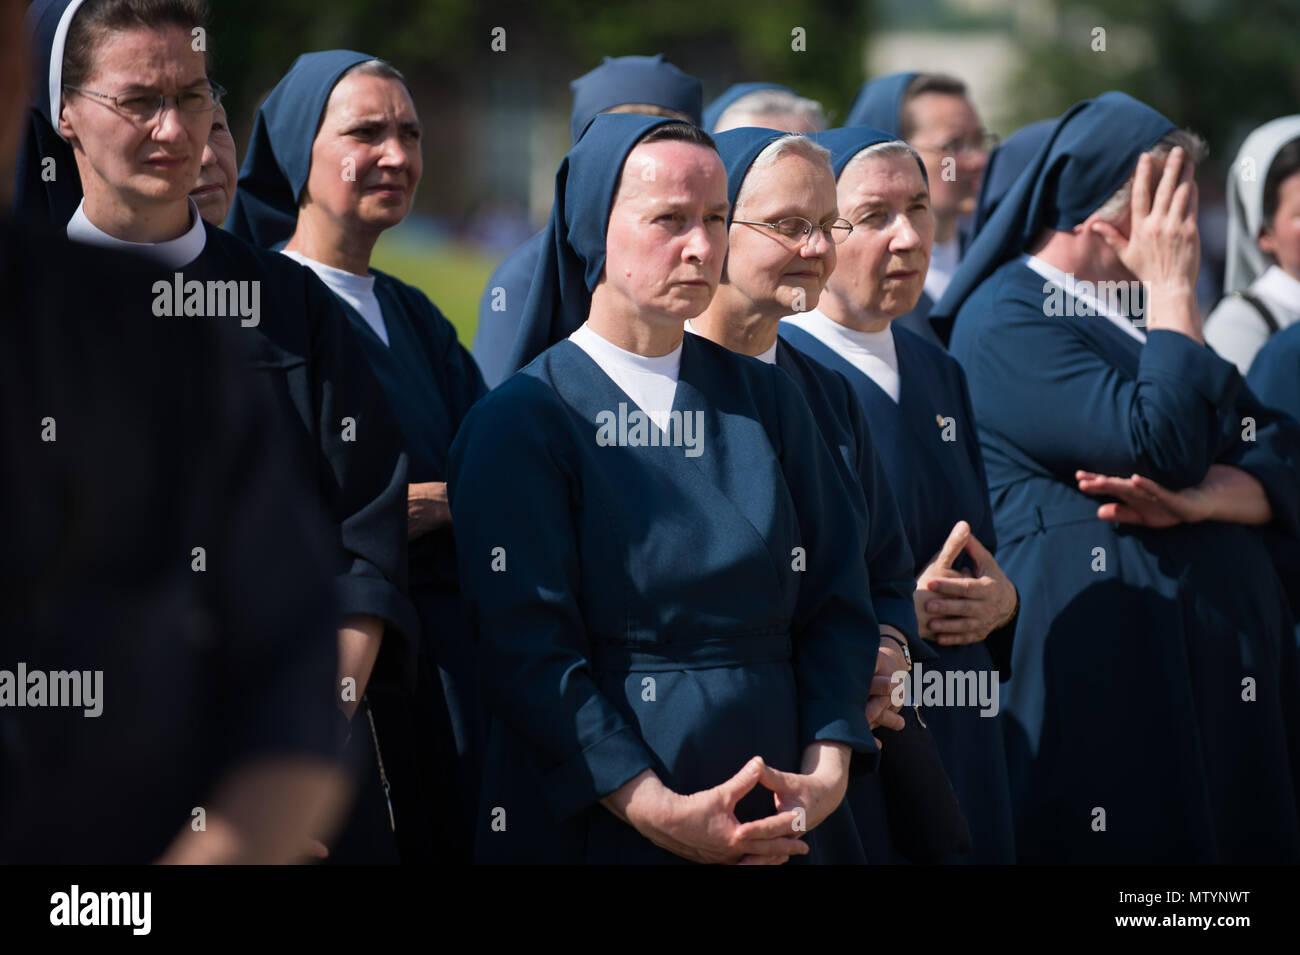 Nuns And Jesus Stock Photos Nuns And Jesus Stock Images Alamy